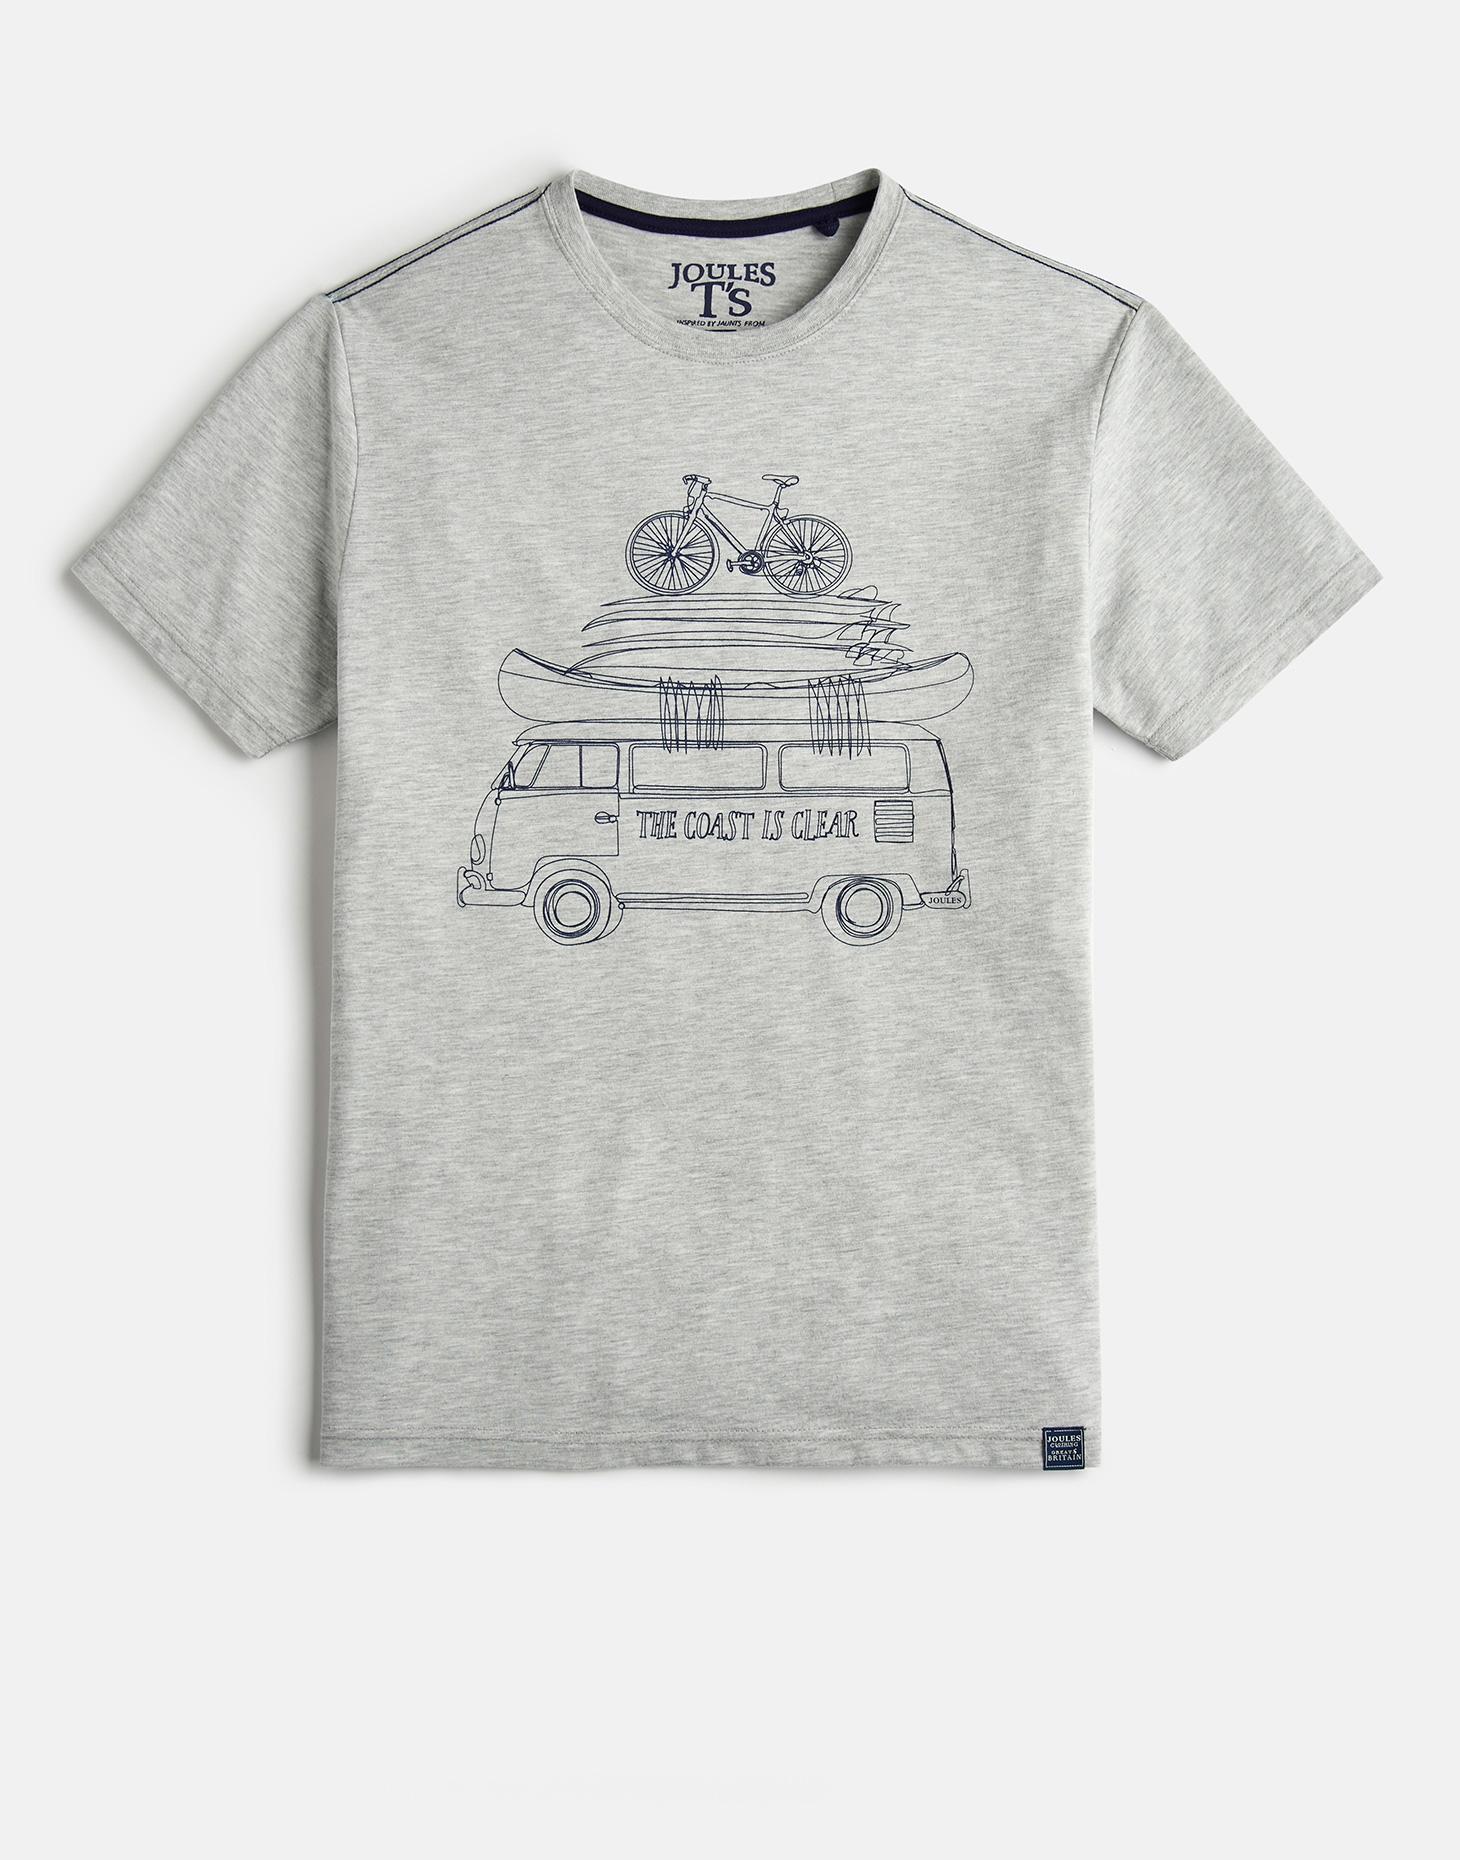 coast mountain bus company bus driver application